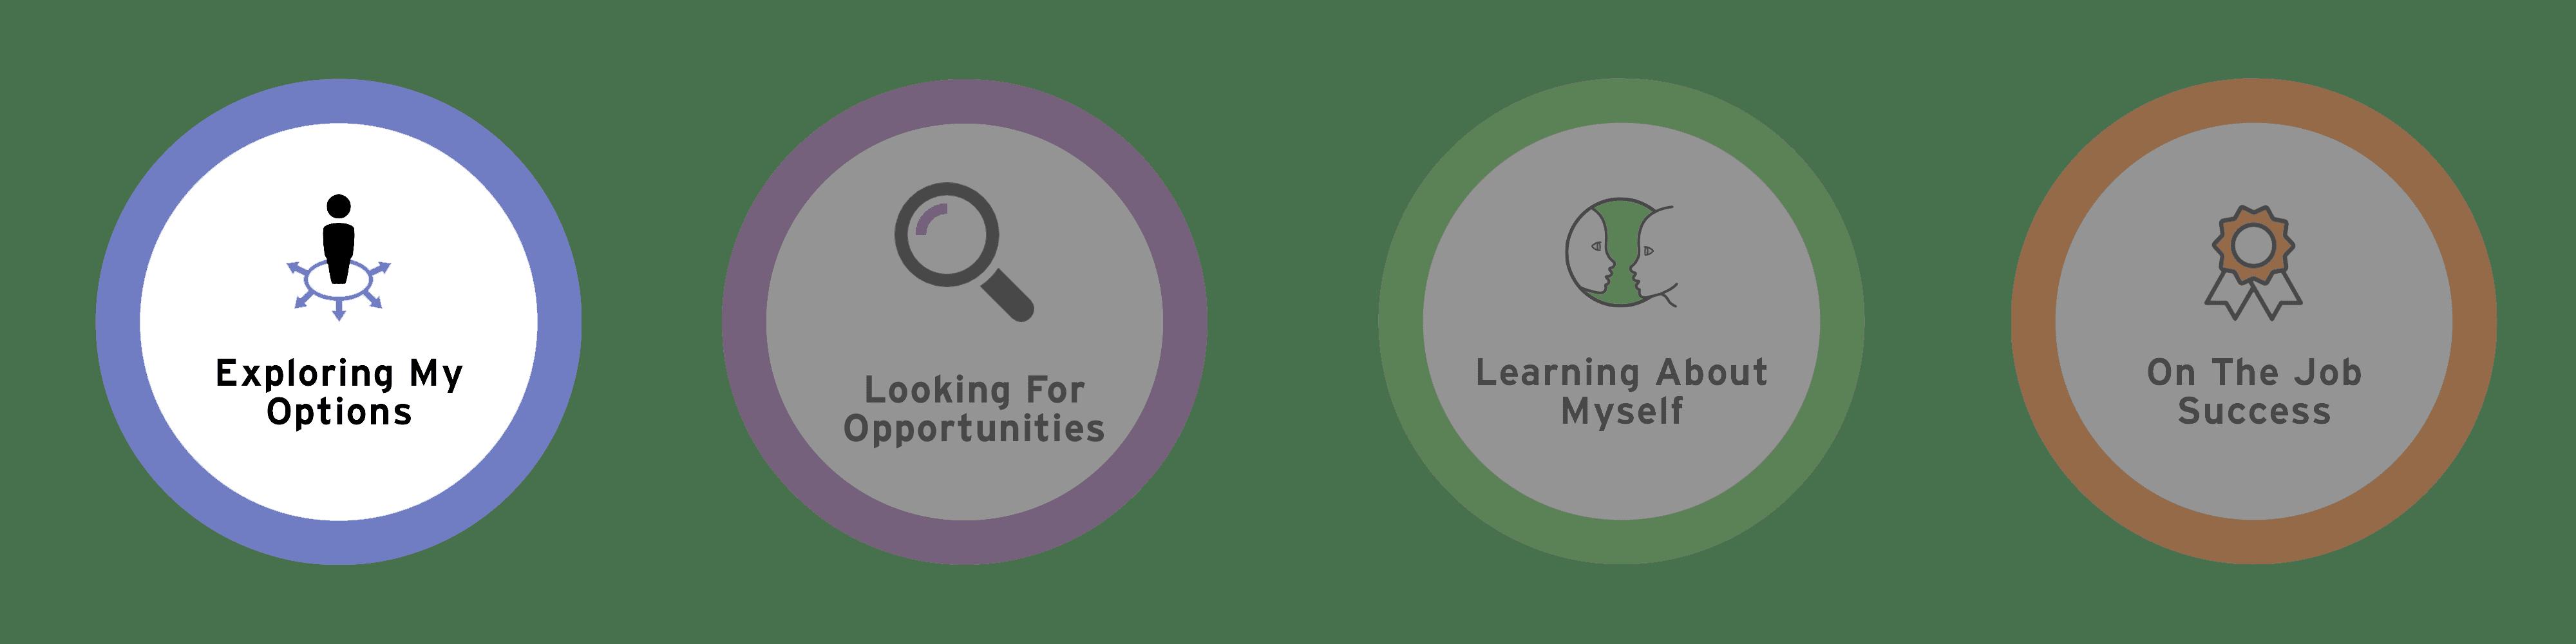 Exploring Options - My Career Plan